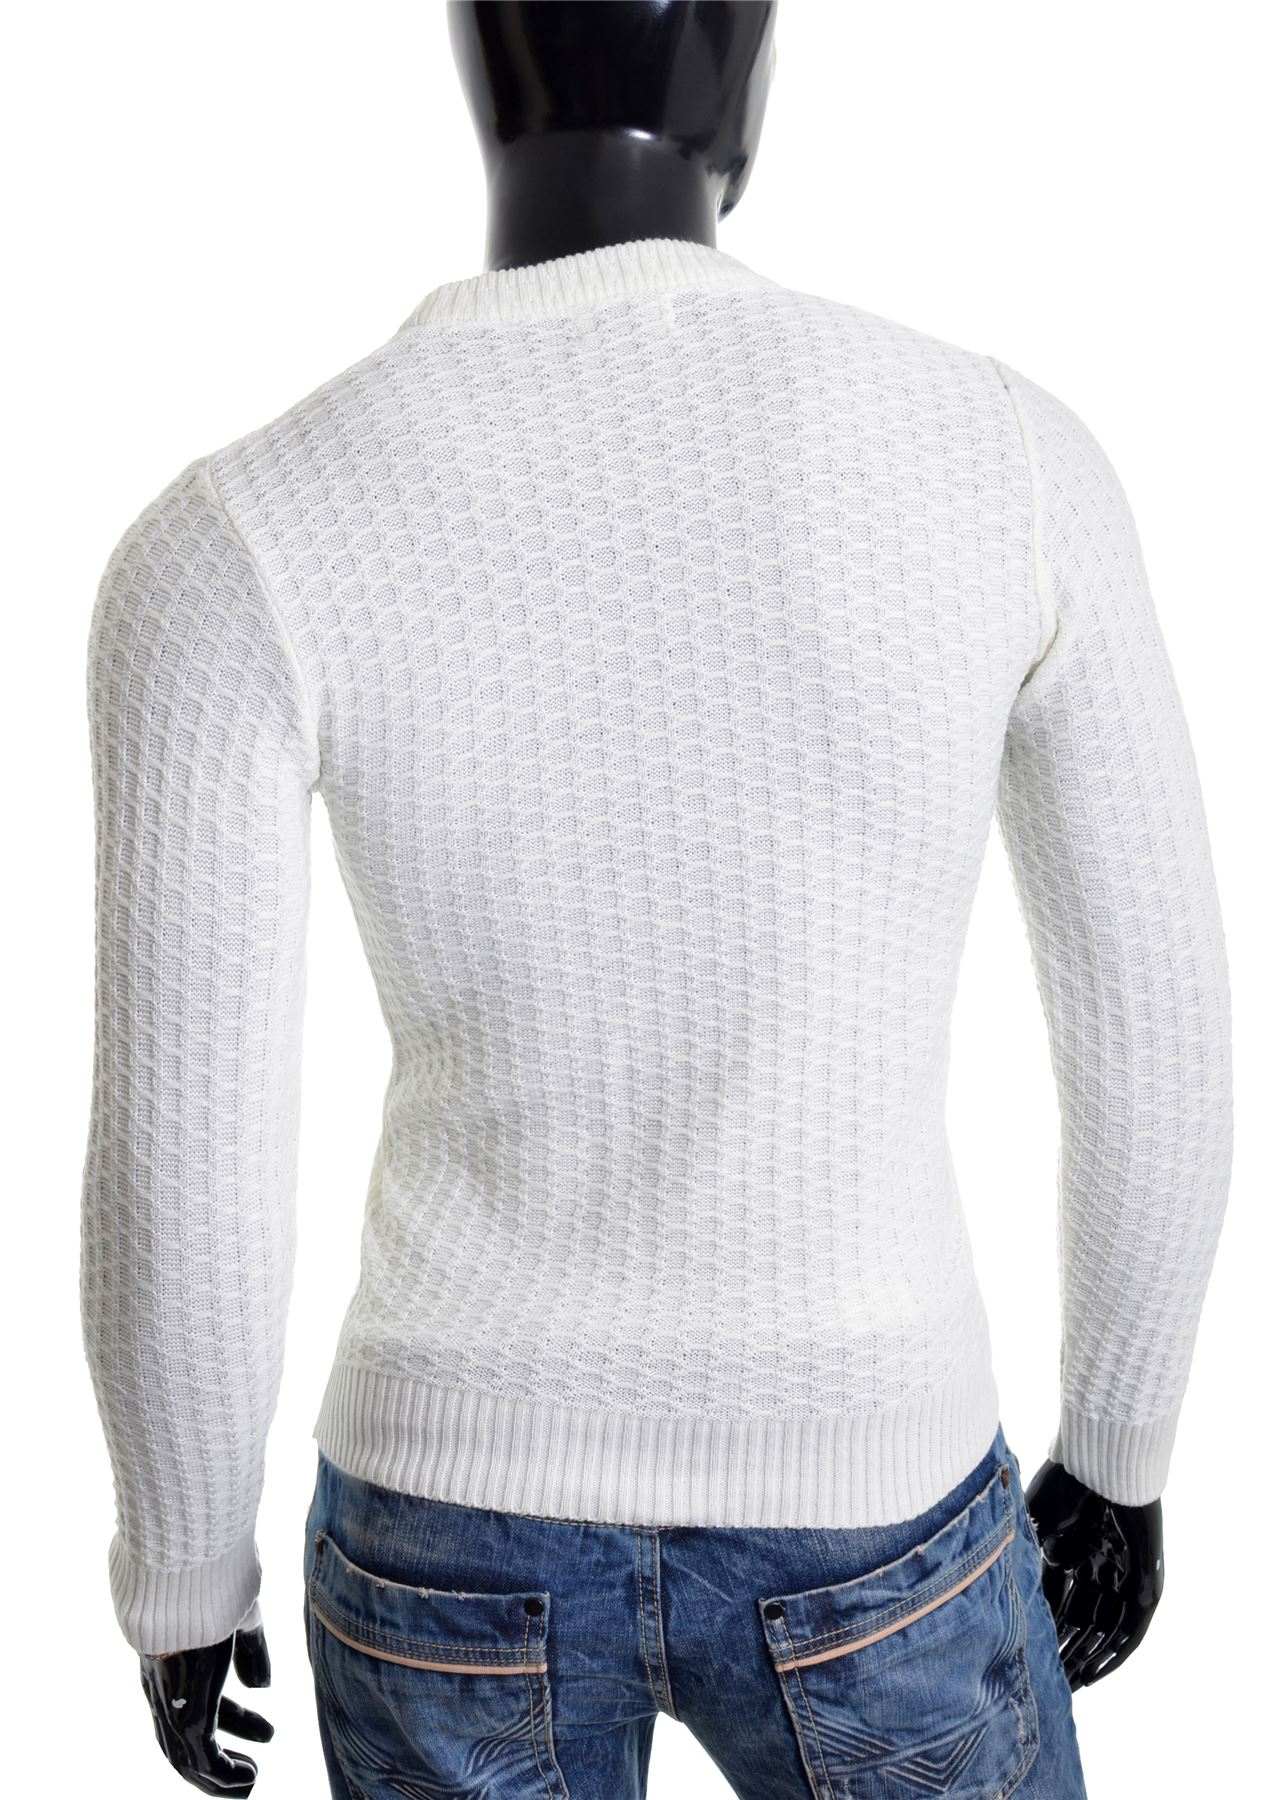 D-amp-R-Men-039-s-Wool-Knit-Jumper-Smart-Long-Sleeve-Sweater-Crew-Neck-Top thumbnail 11